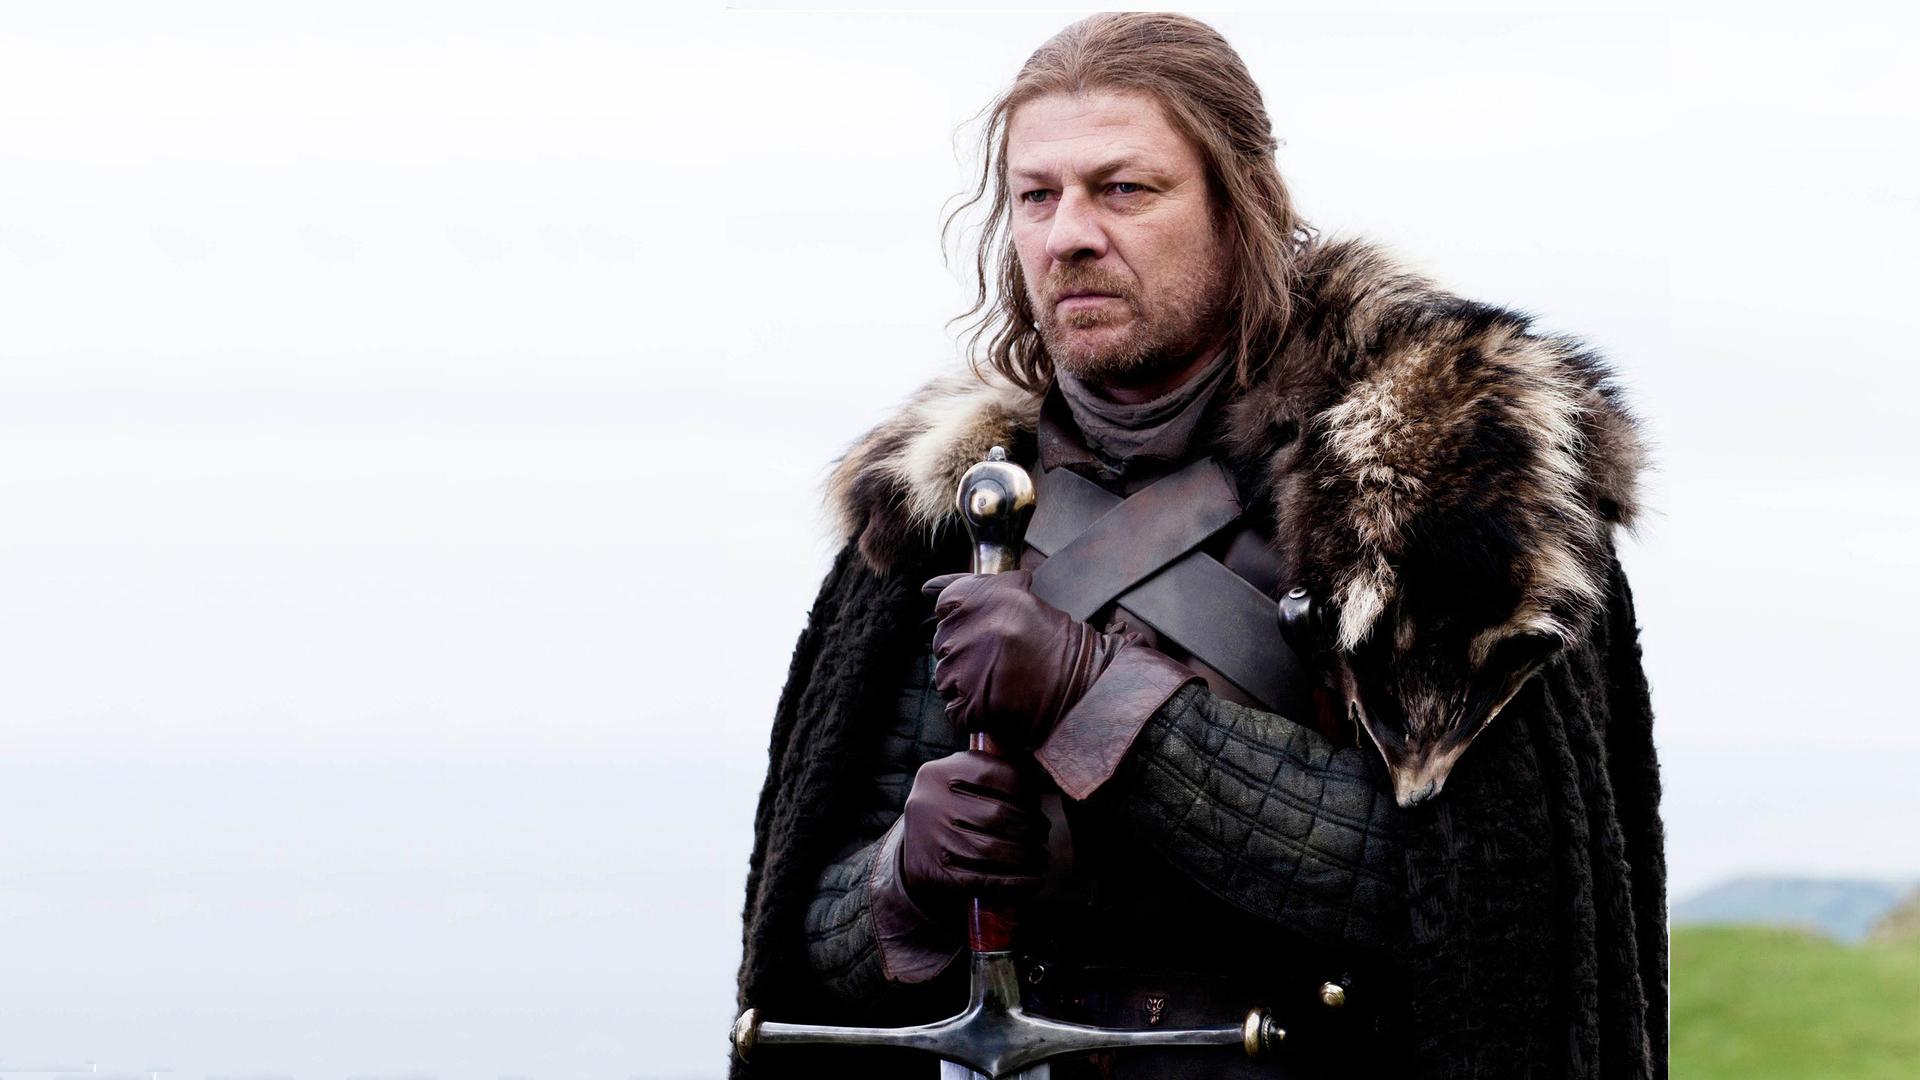 ned-stark-game-thrones-season-6-spoilers